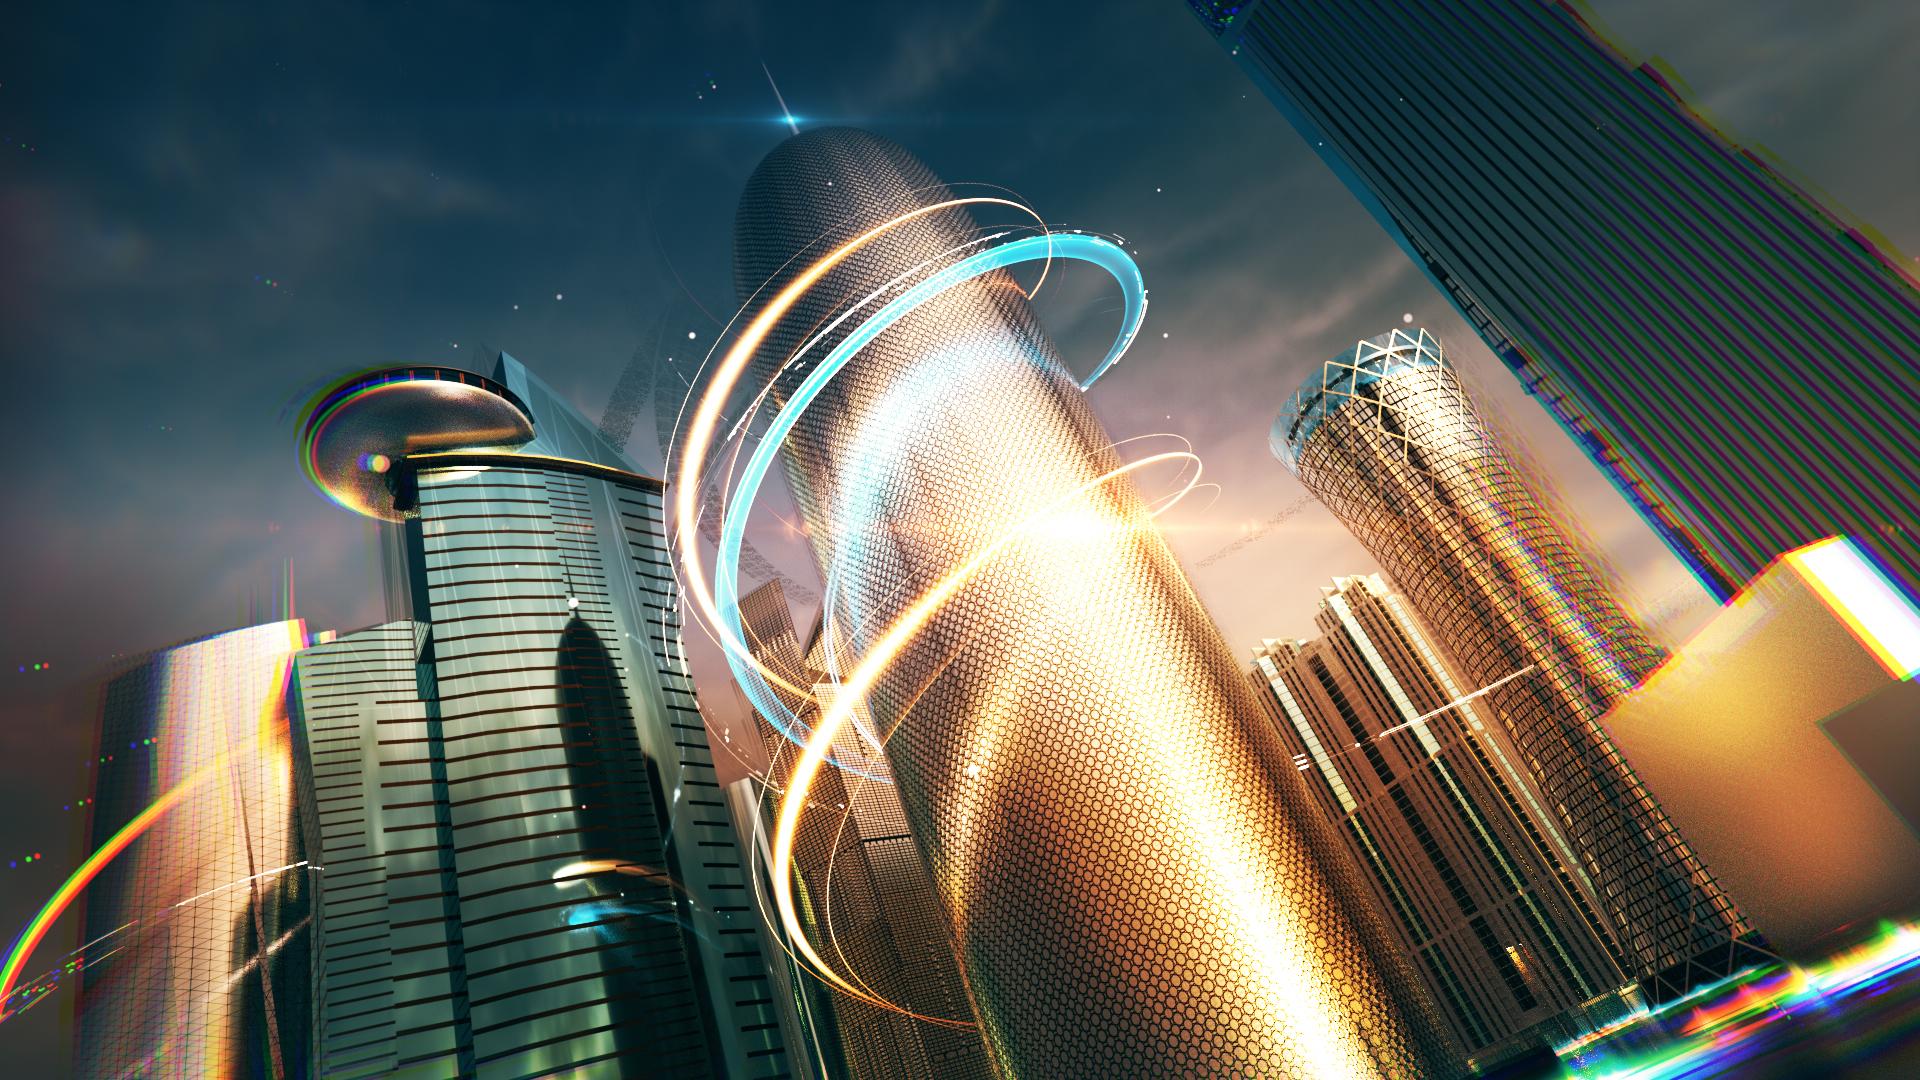 Broadcast_Design_33_Qatar_Renderon (10).jpg